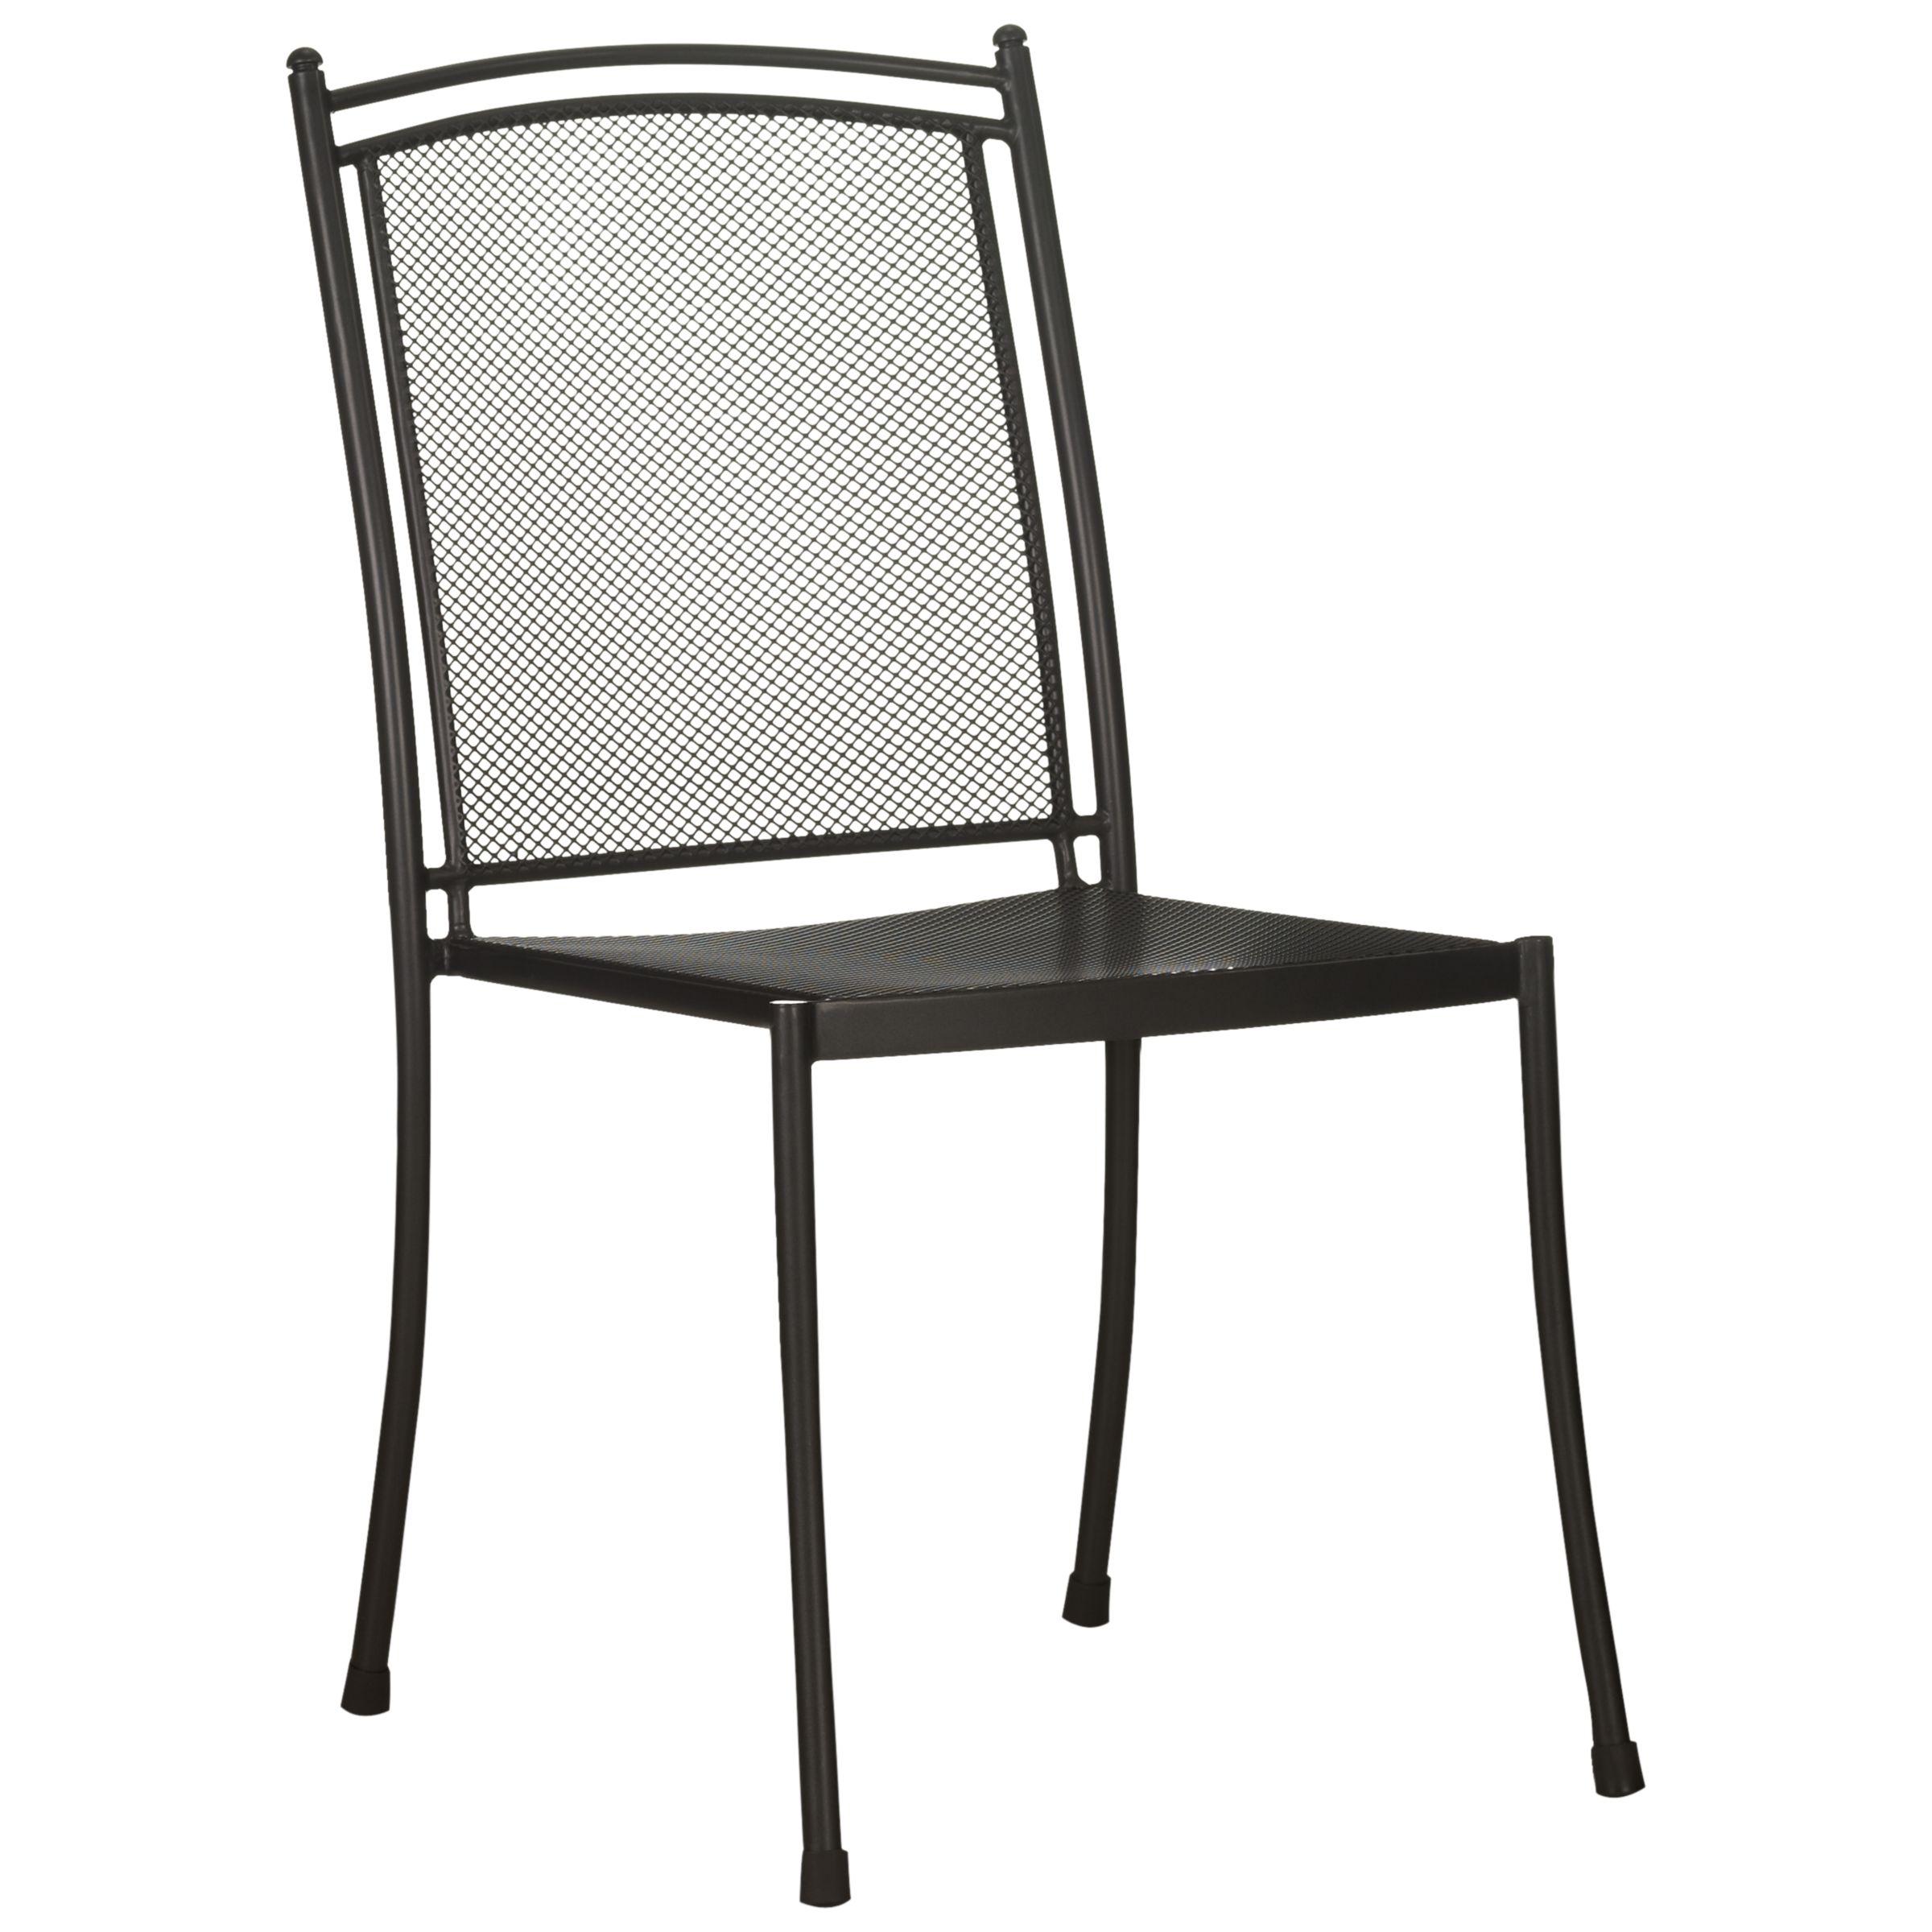 John Lewis Henley by KETTLER John Lewis Henley by KETTLER Outdoor Straight Side Chair